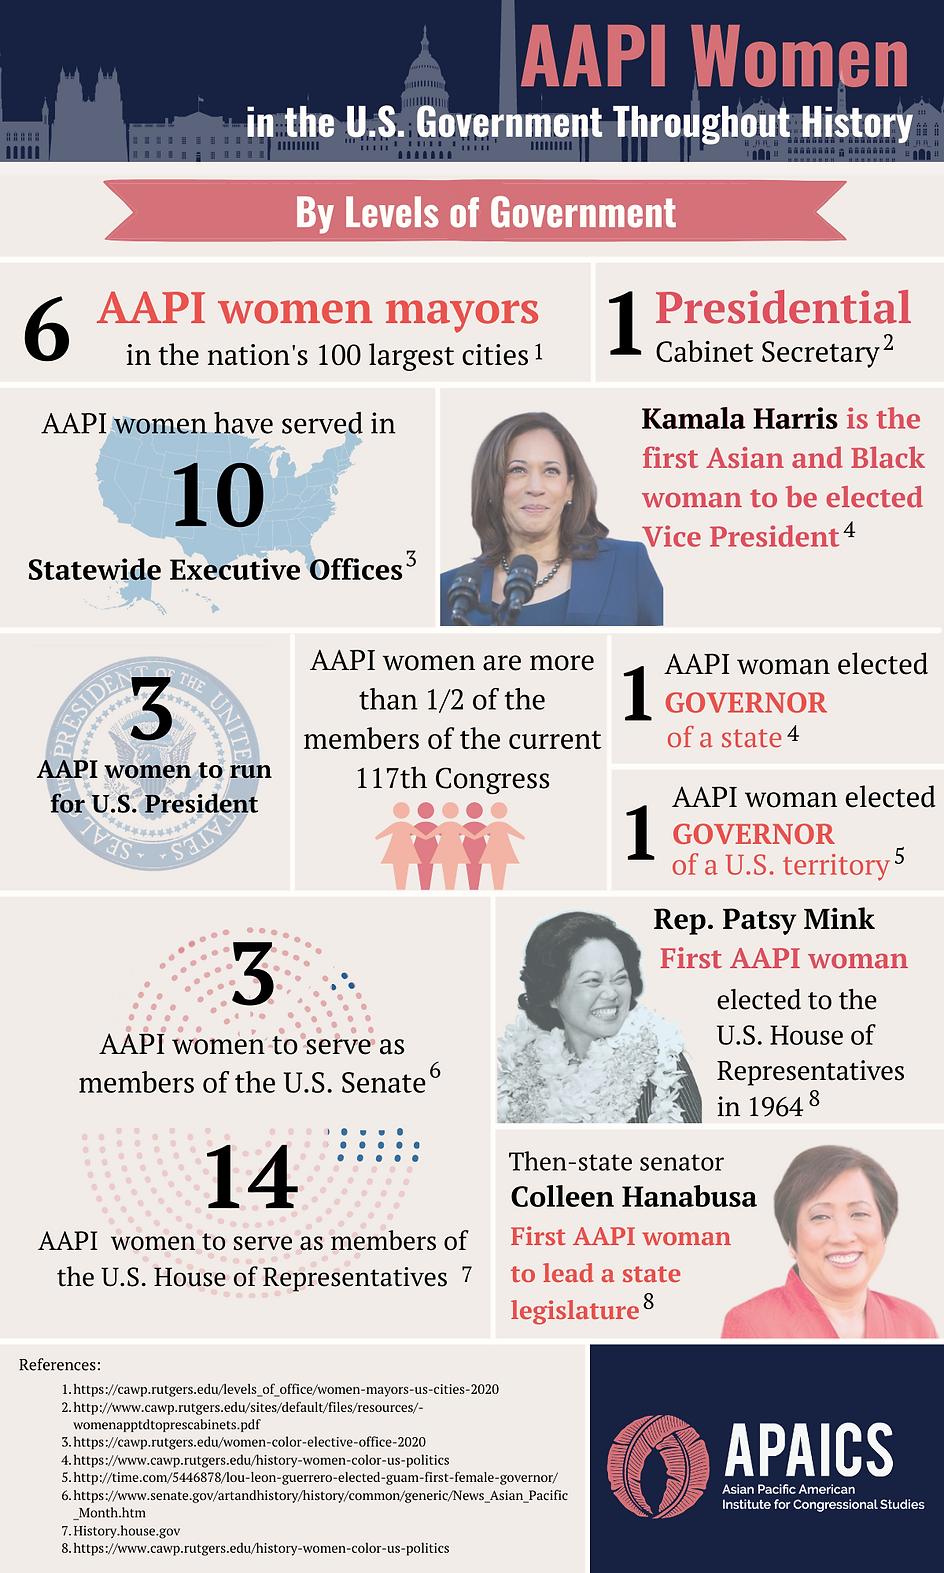 Current-AAPI-Women-thru-History-2020_202